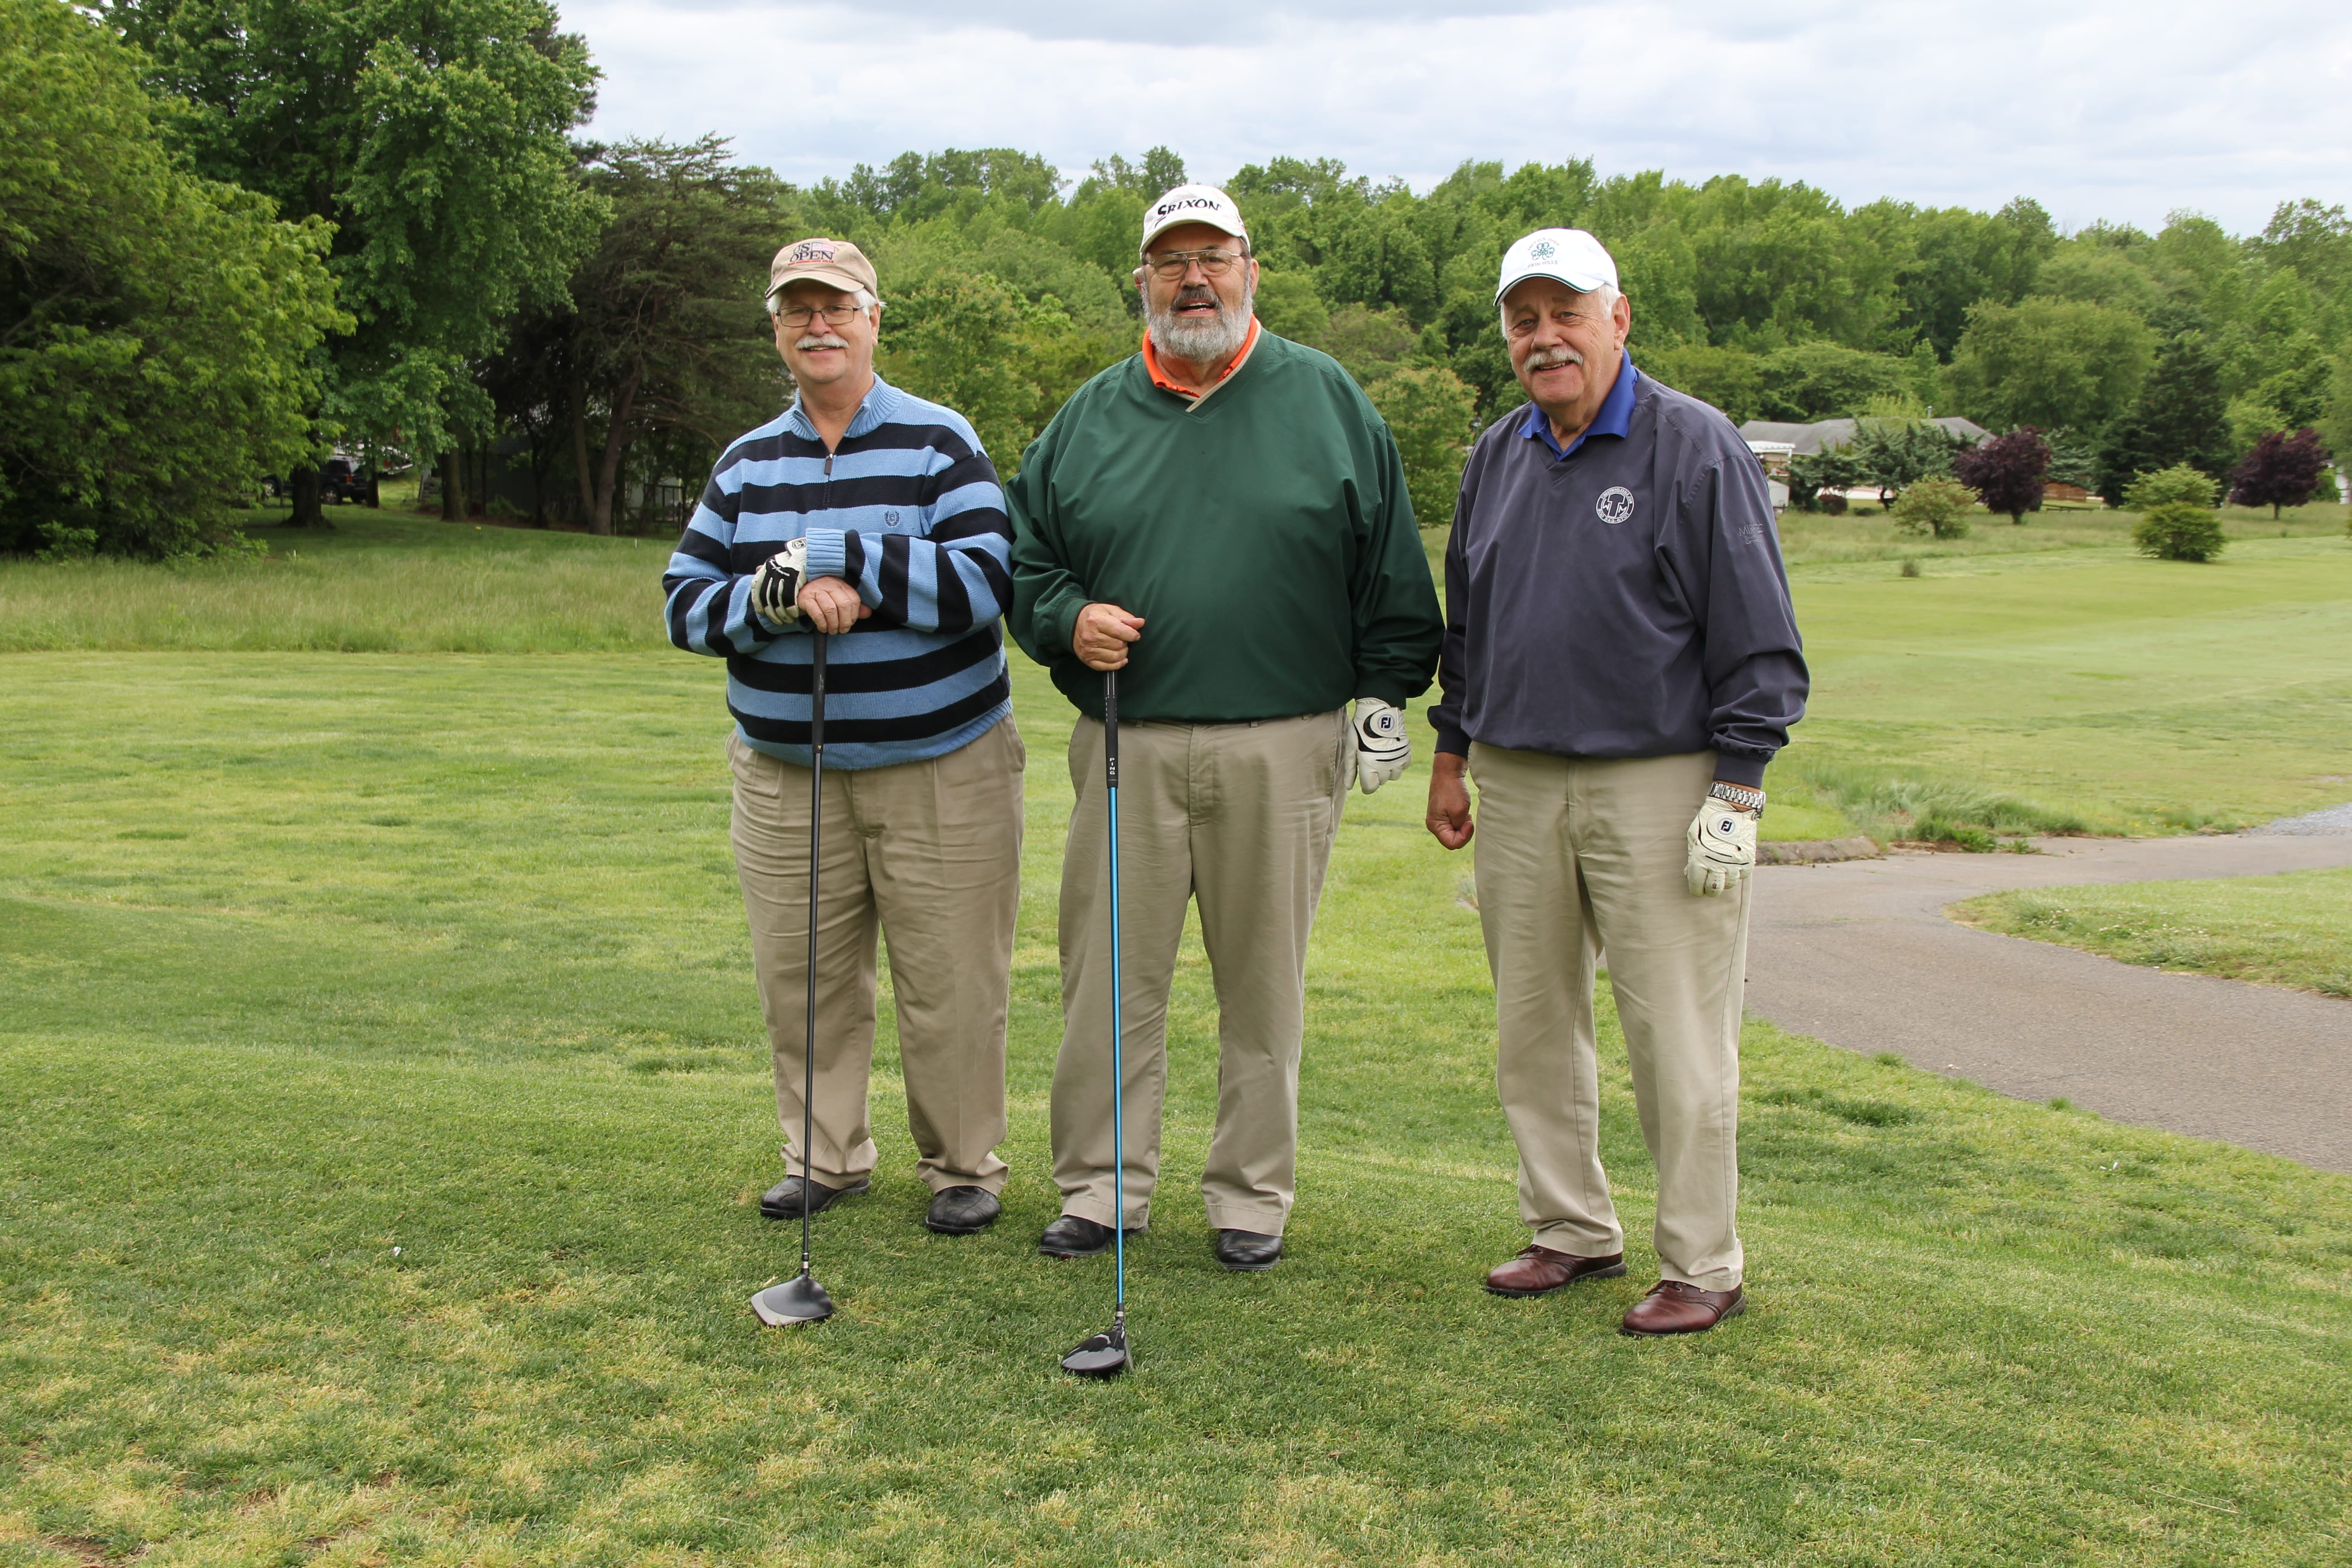 IMG_5942 - Team 17 - Bill Nicholas, John Wenke, Dick Blake